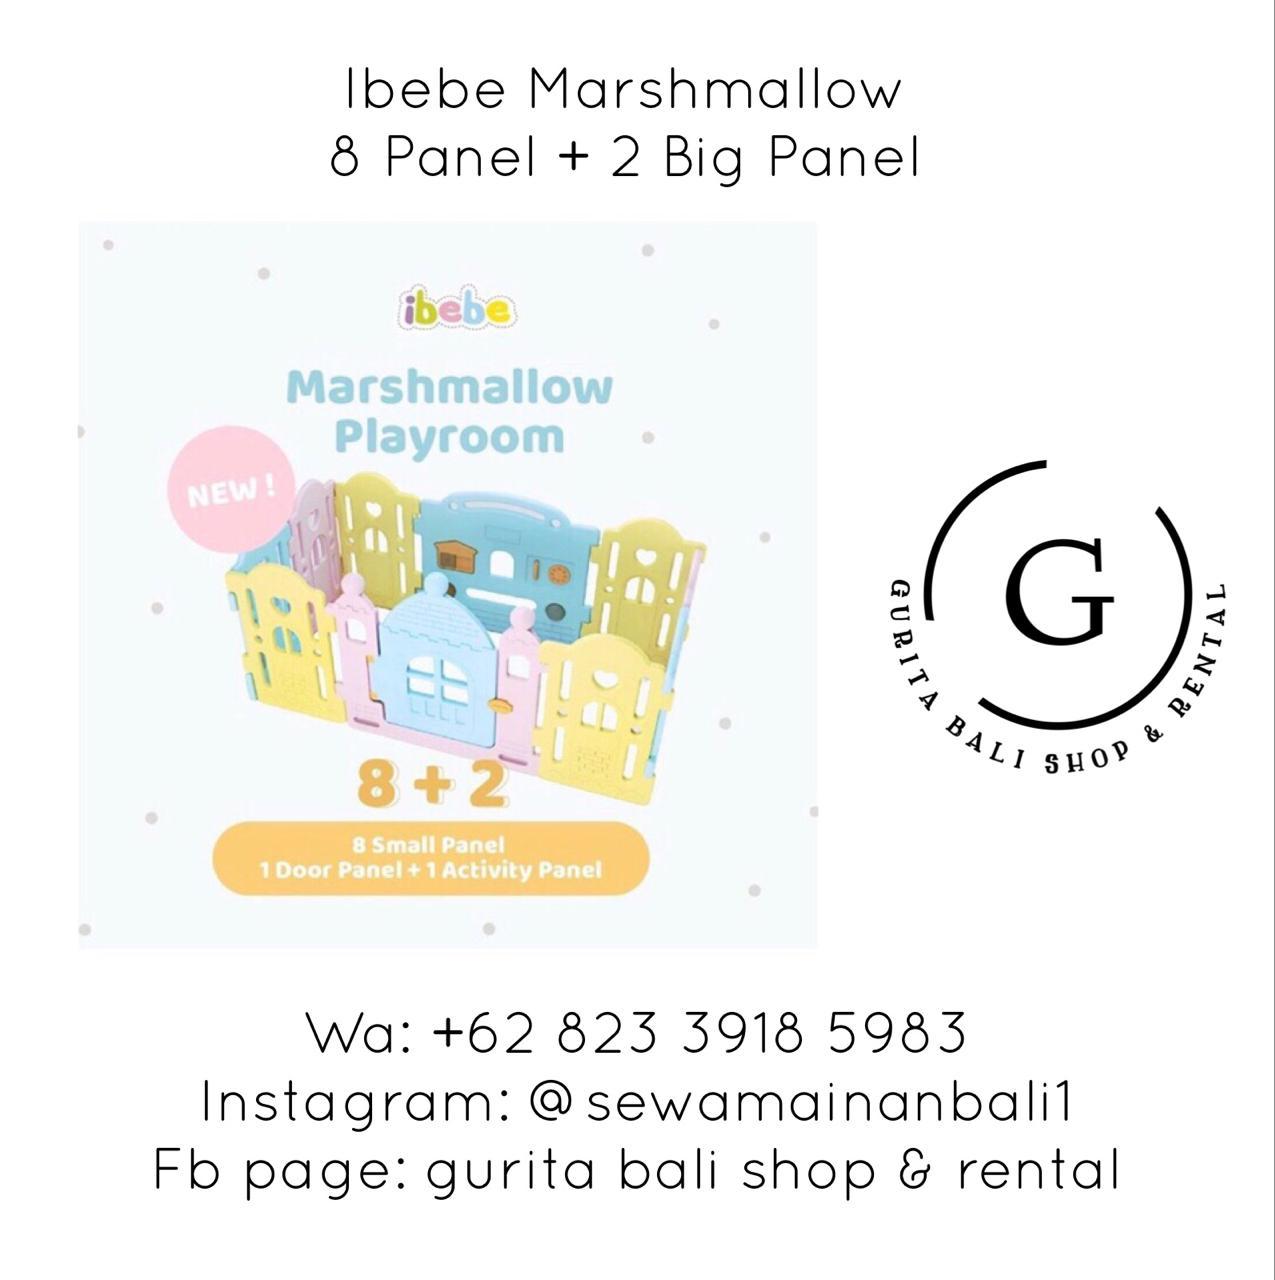 IBEBE MARSHMALLOW 8+2 PANEL (A)